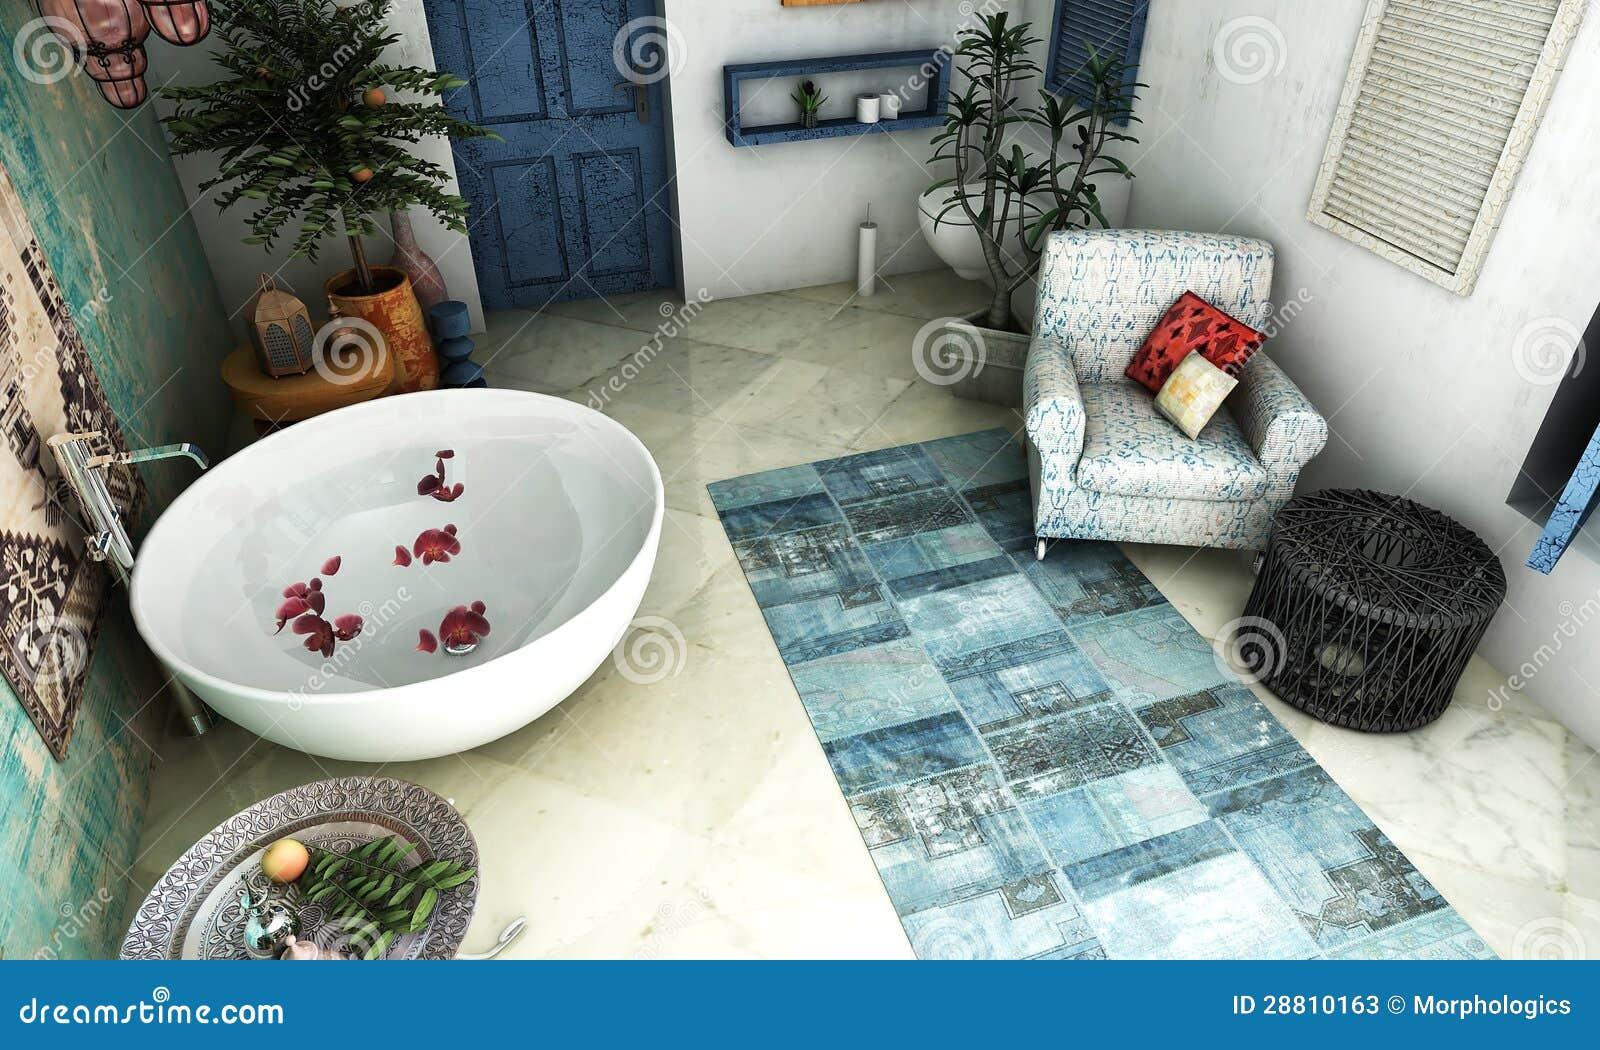 Marokanska Lazienka Obraz Stock Obraz Zlozonej Z Dzien 28810163